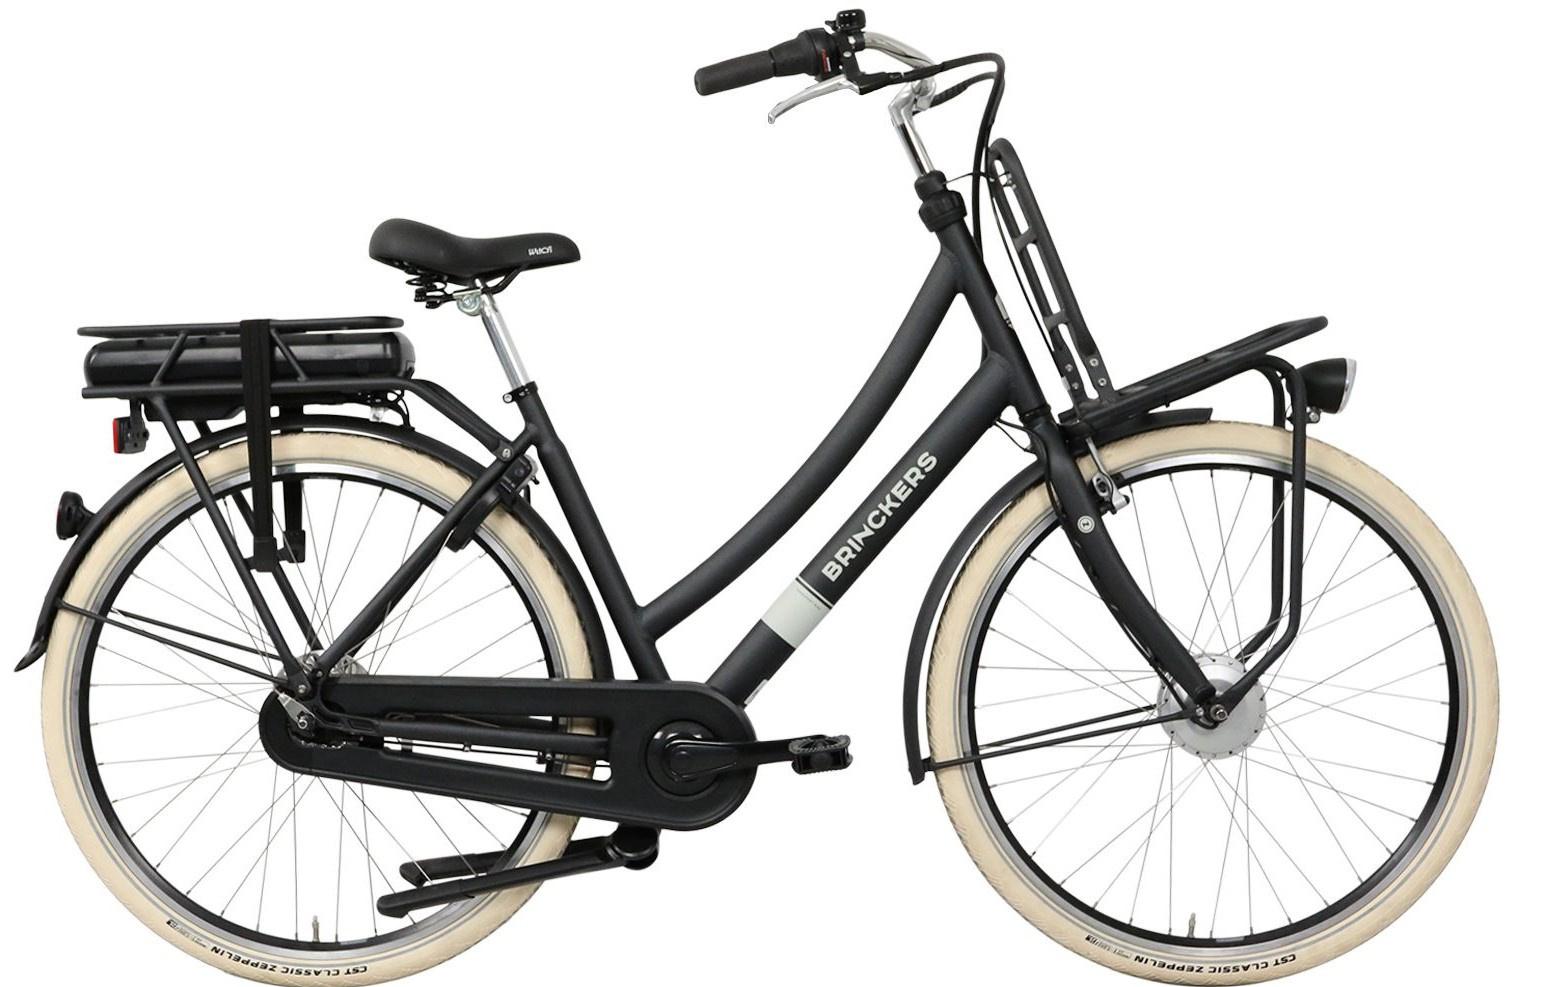 Brinckers Baxter elektrische fiets 7V met voorwielmotor